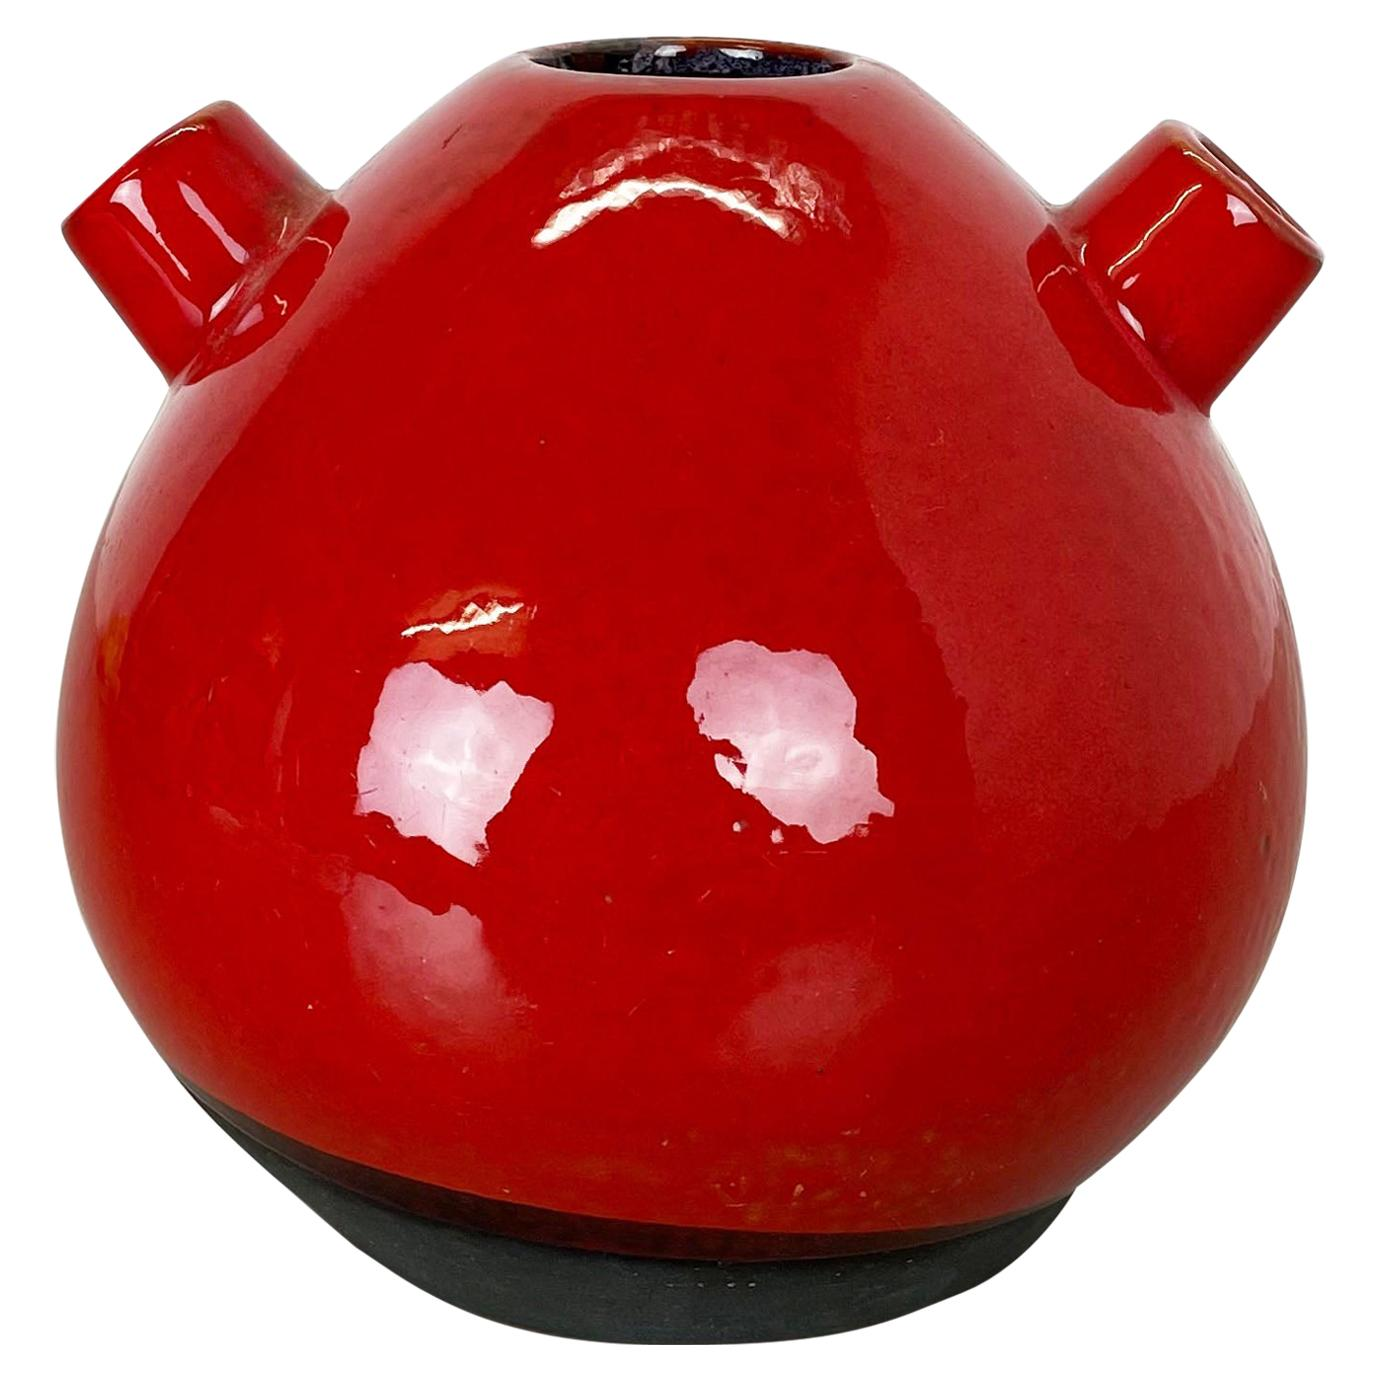 Original 1970 Red Ceramic Studio Pottery Vase by Marei Ceramics, Germany